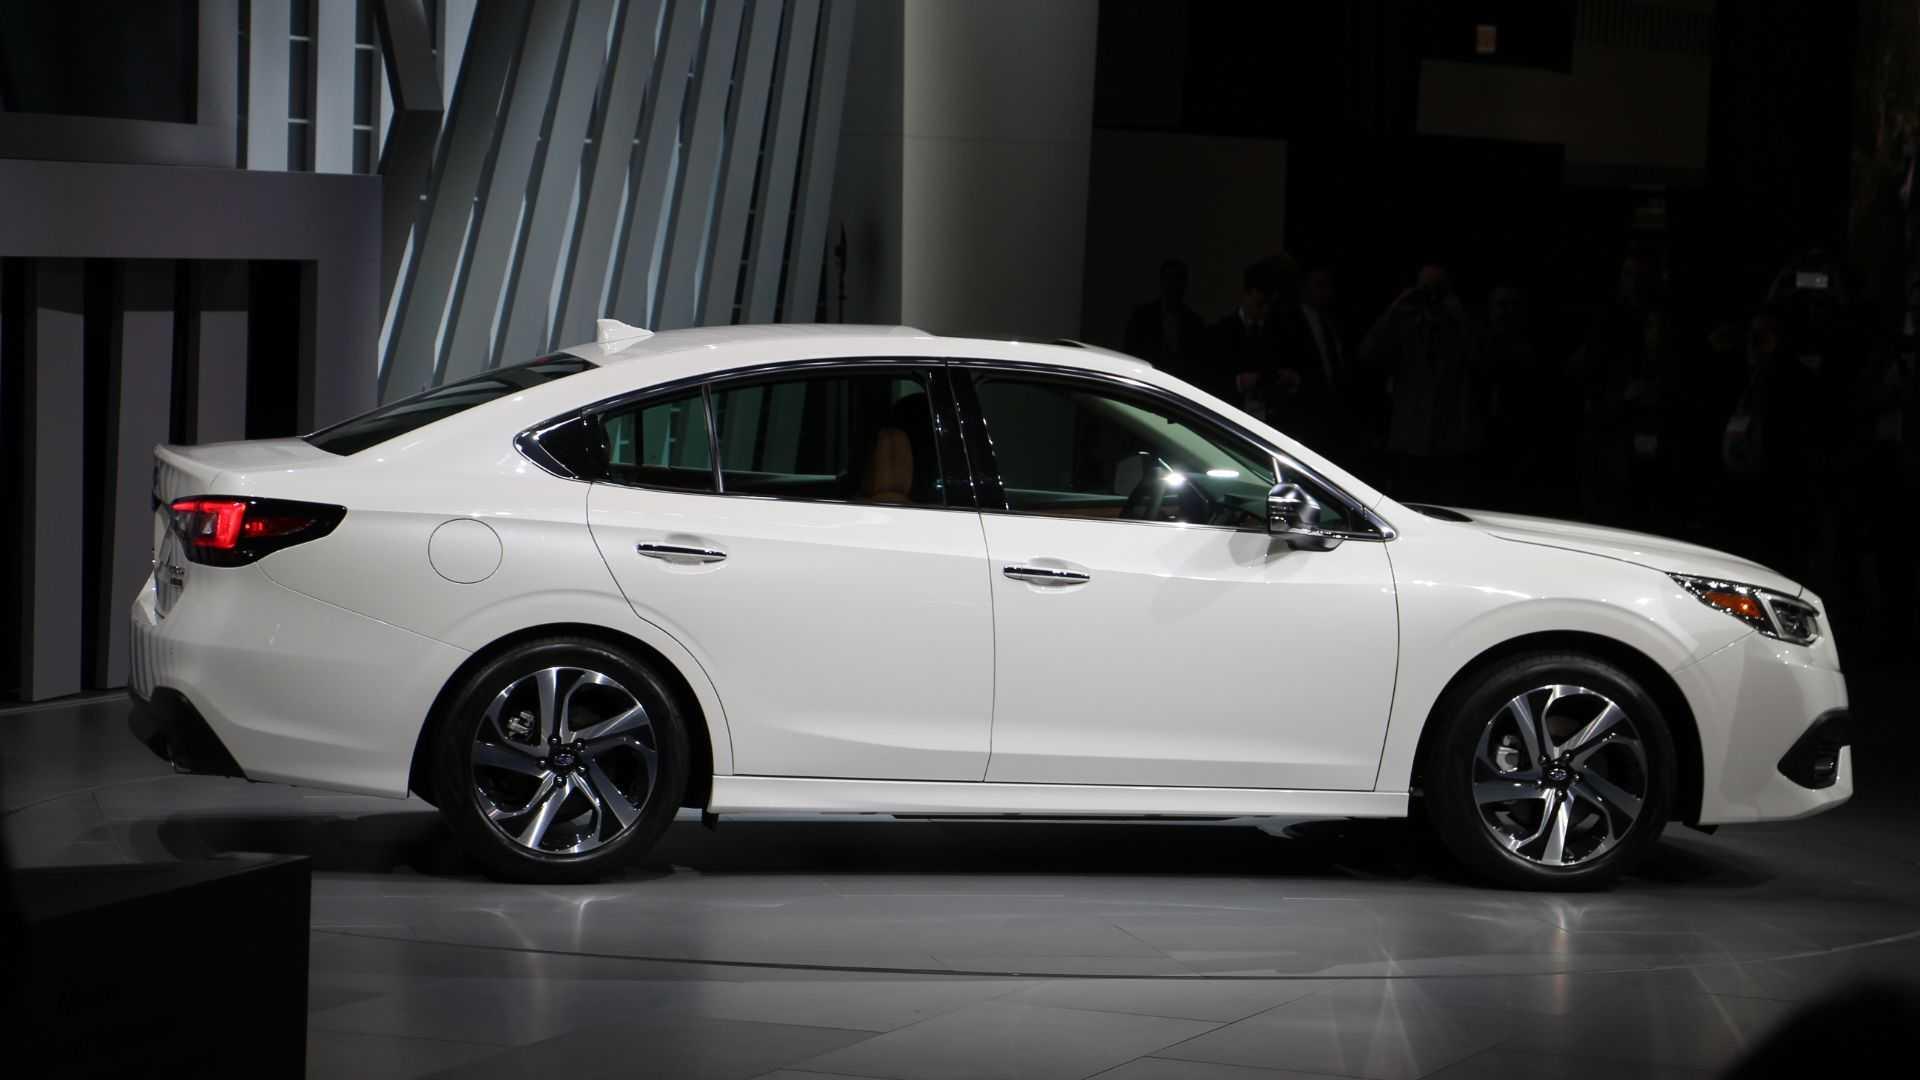 42 Concept of Subaru Japan 2020 Research New with Subaru Japan 2020